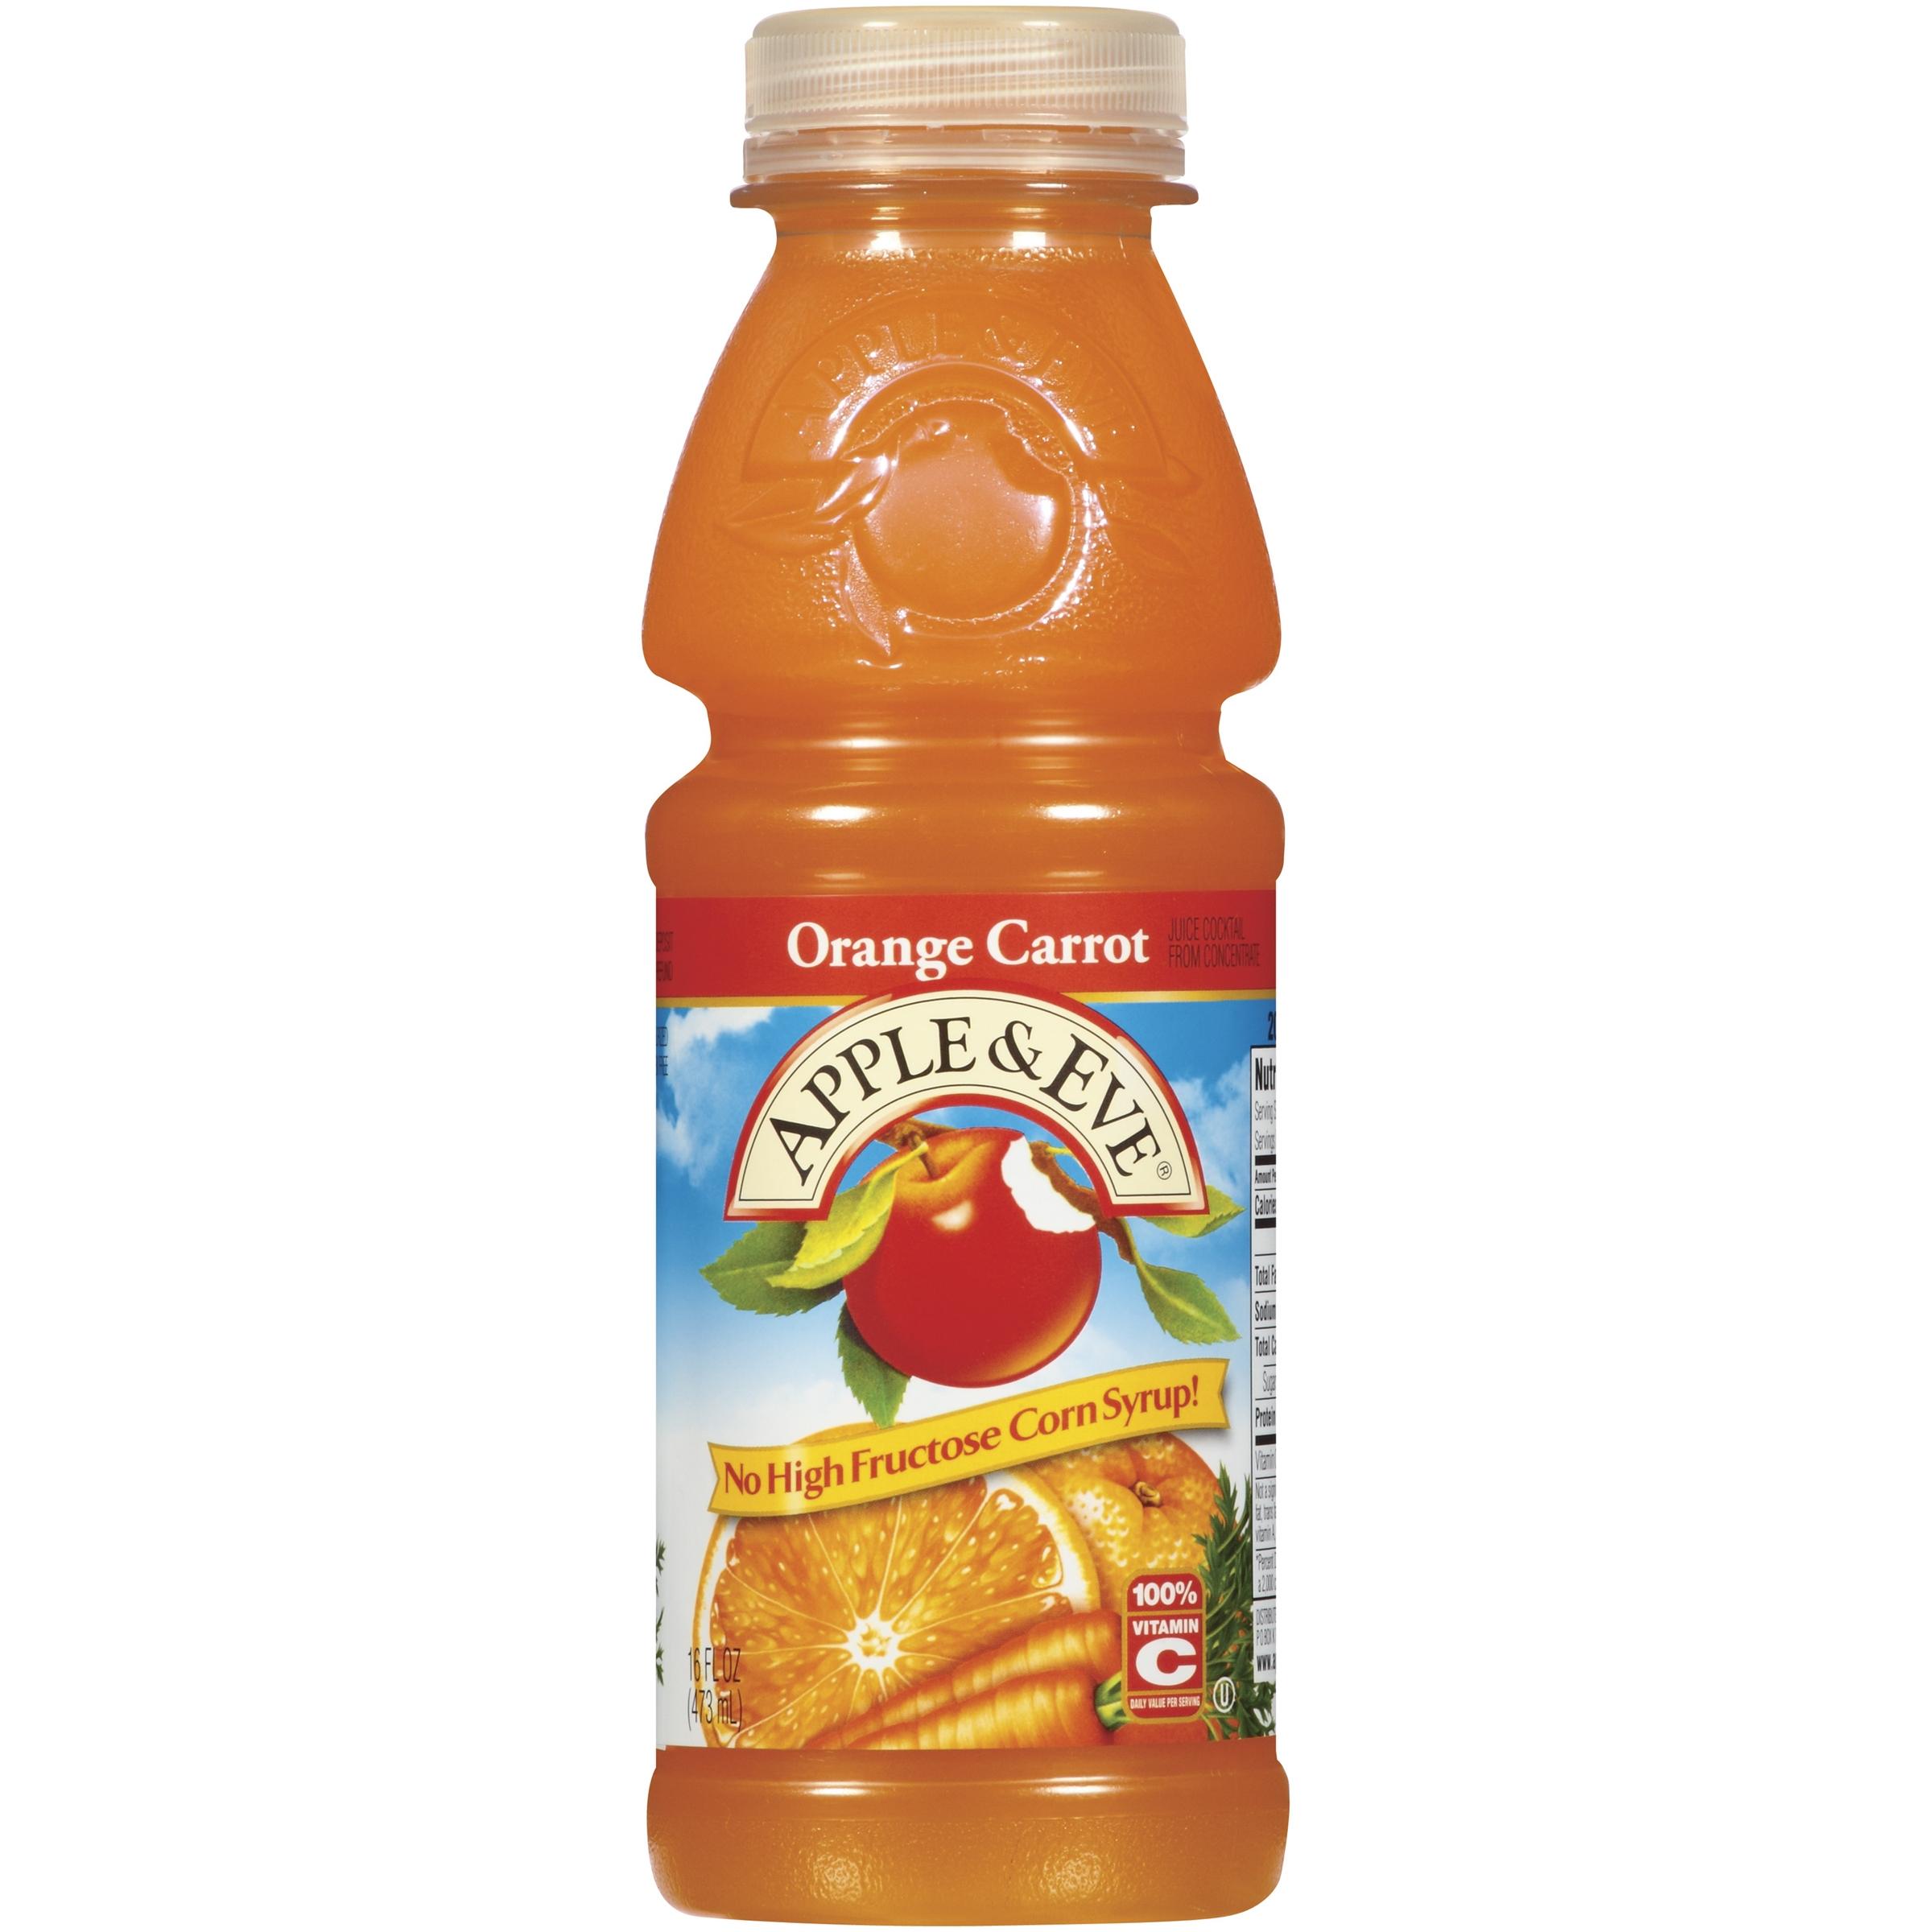 Apple Eve Orange Carrot Juice Cocktail 16 Fl Oz